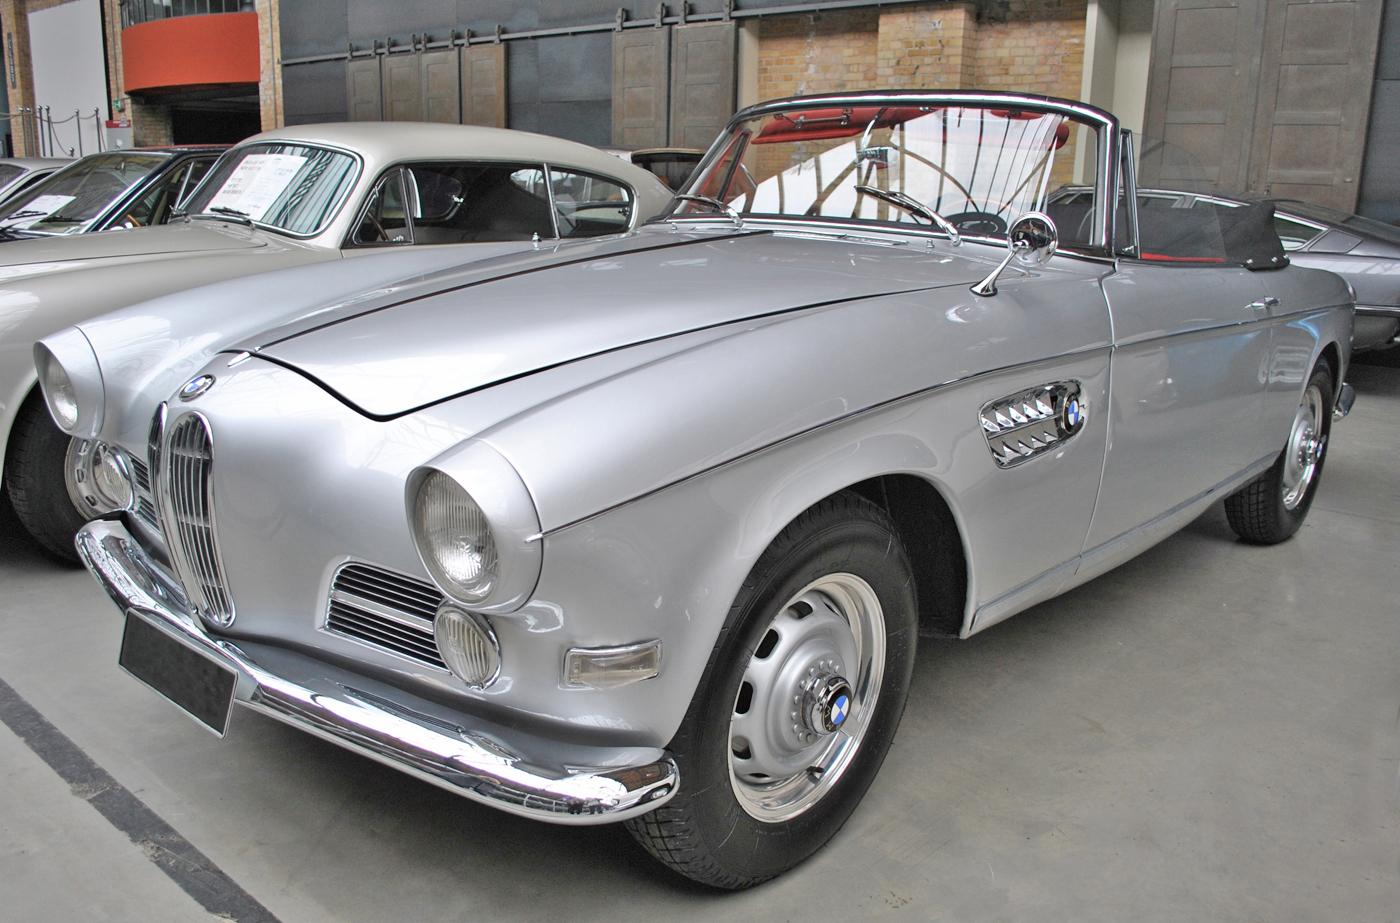 File:BMW503 ClassicRemiseBerlin.jpg - Wikimedia Commons